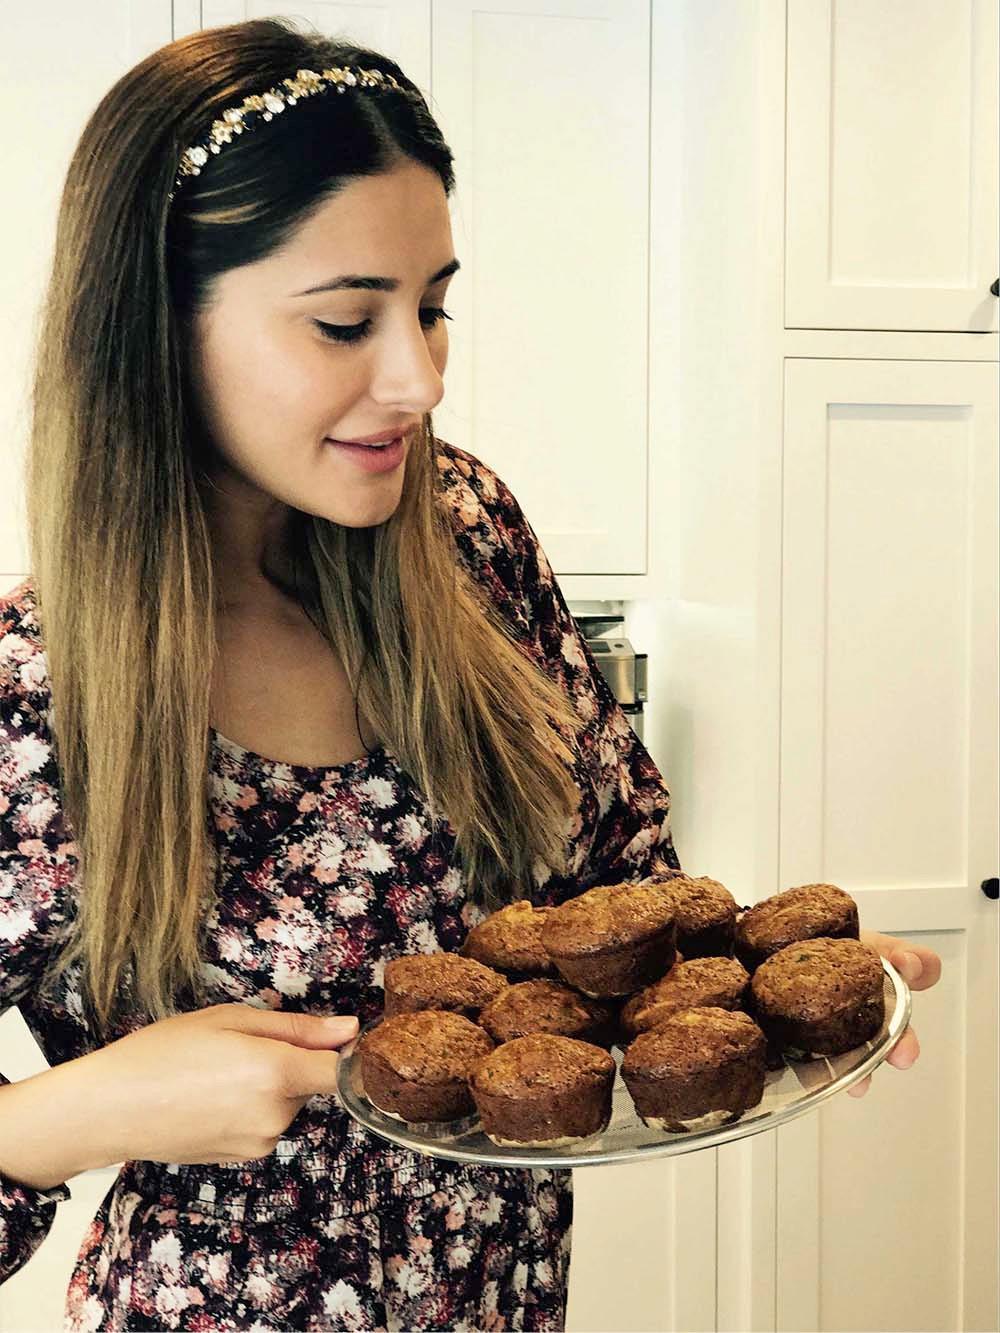 Delicious zucchini carrot apple muffins